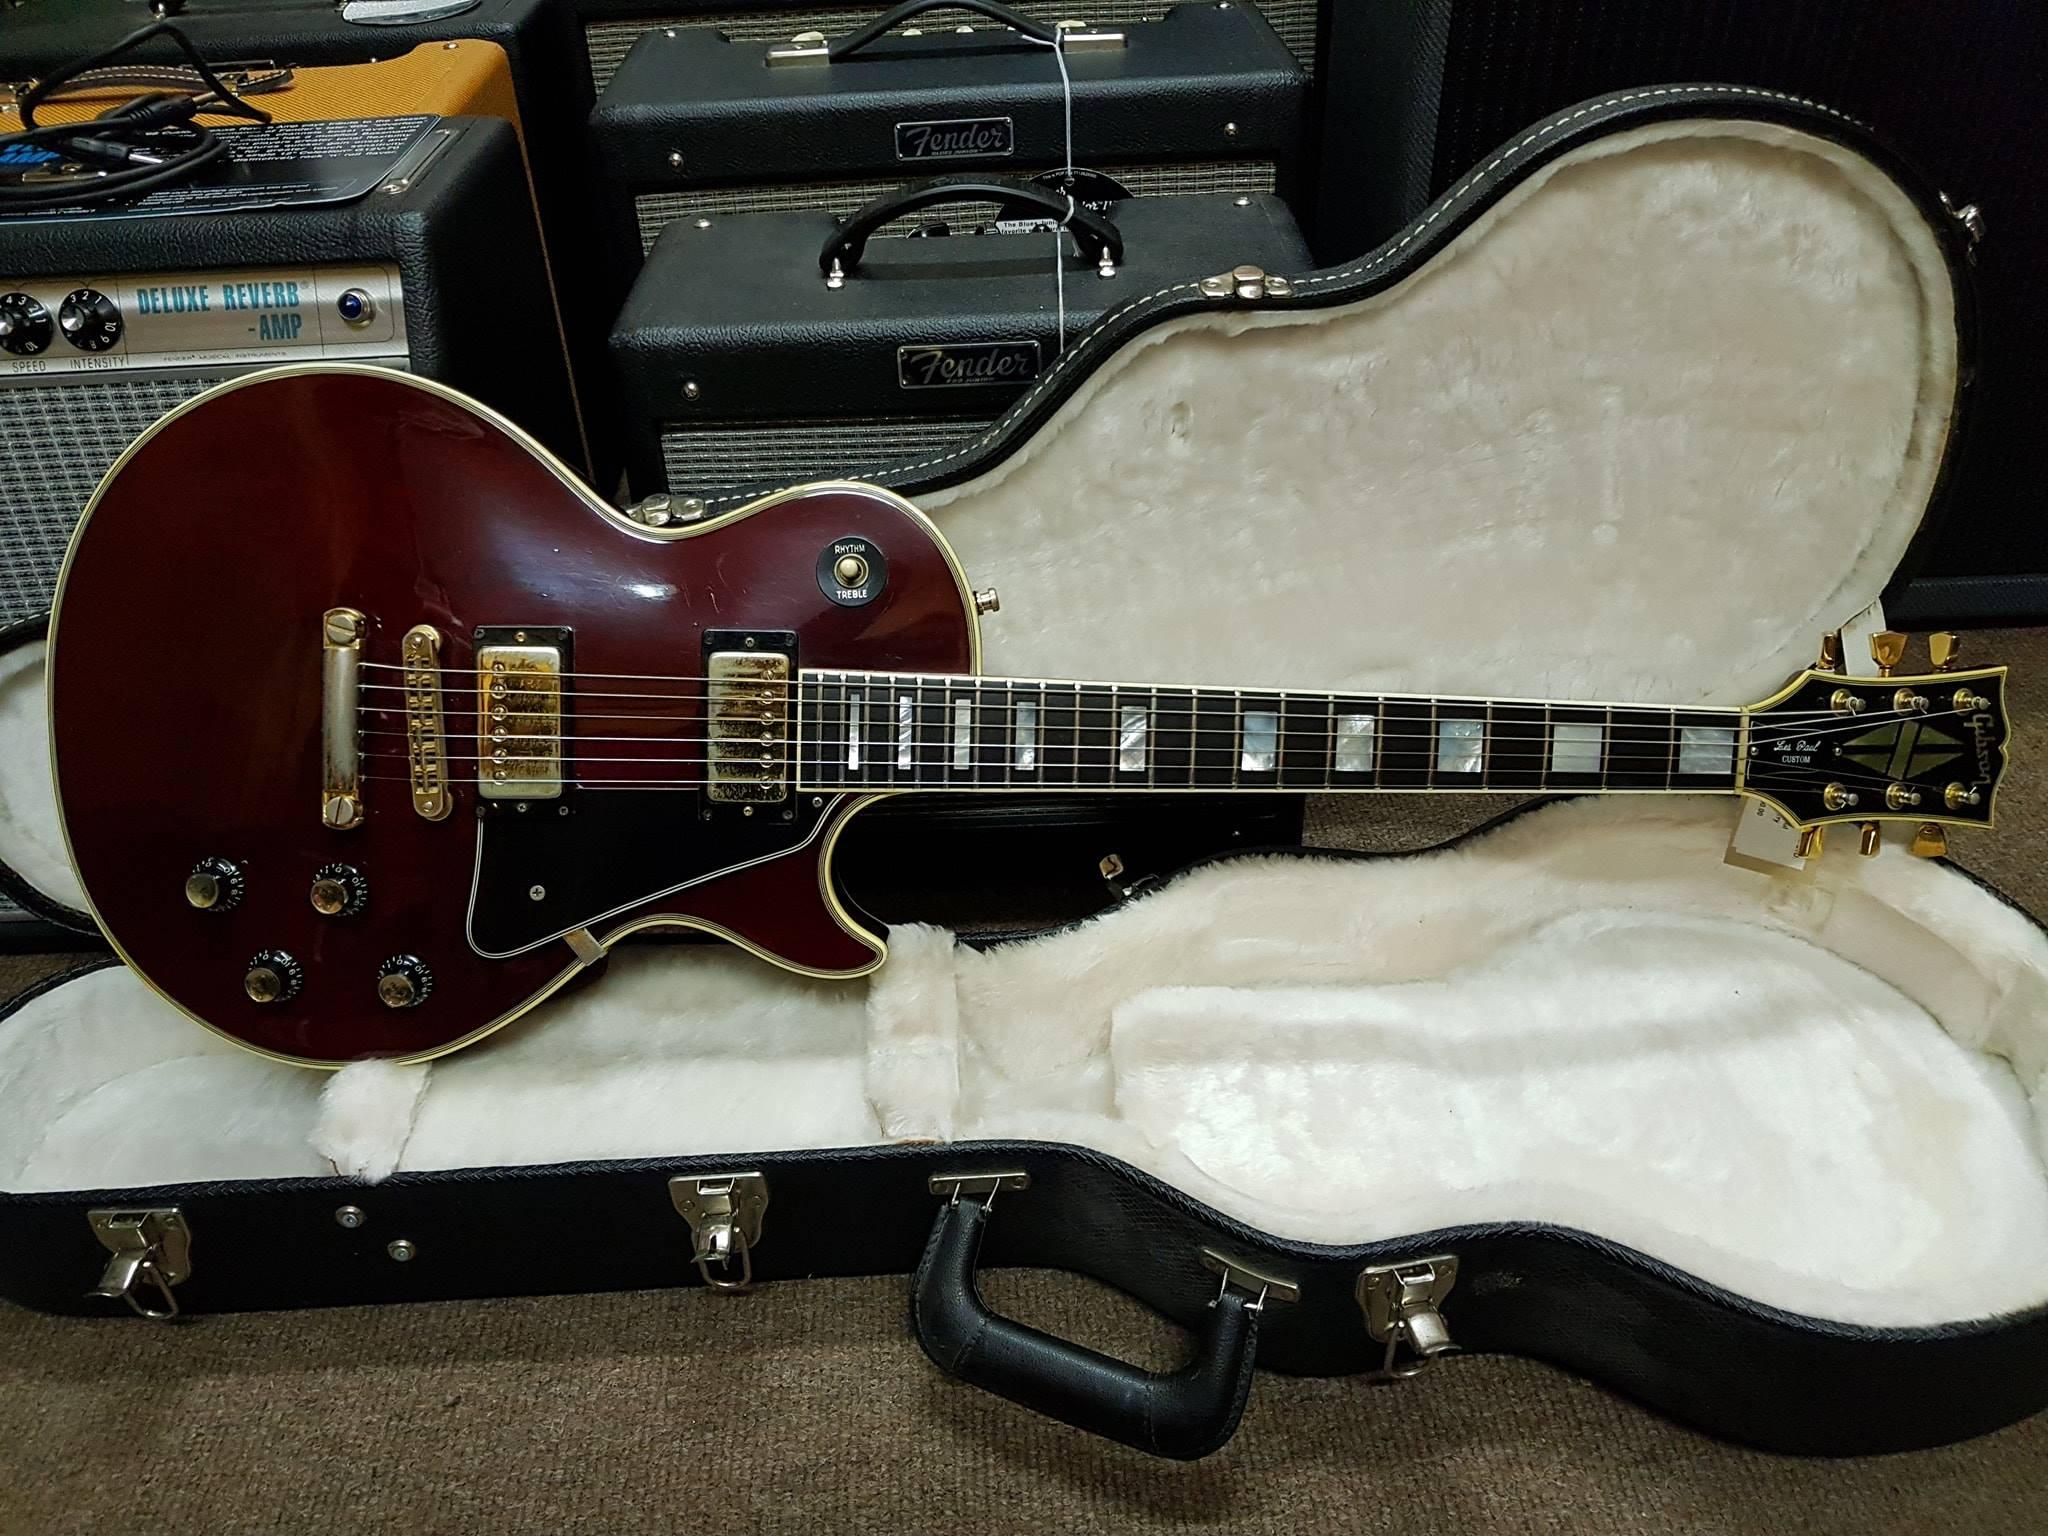 Vintage Electric Guitars, Jimi's Music Store